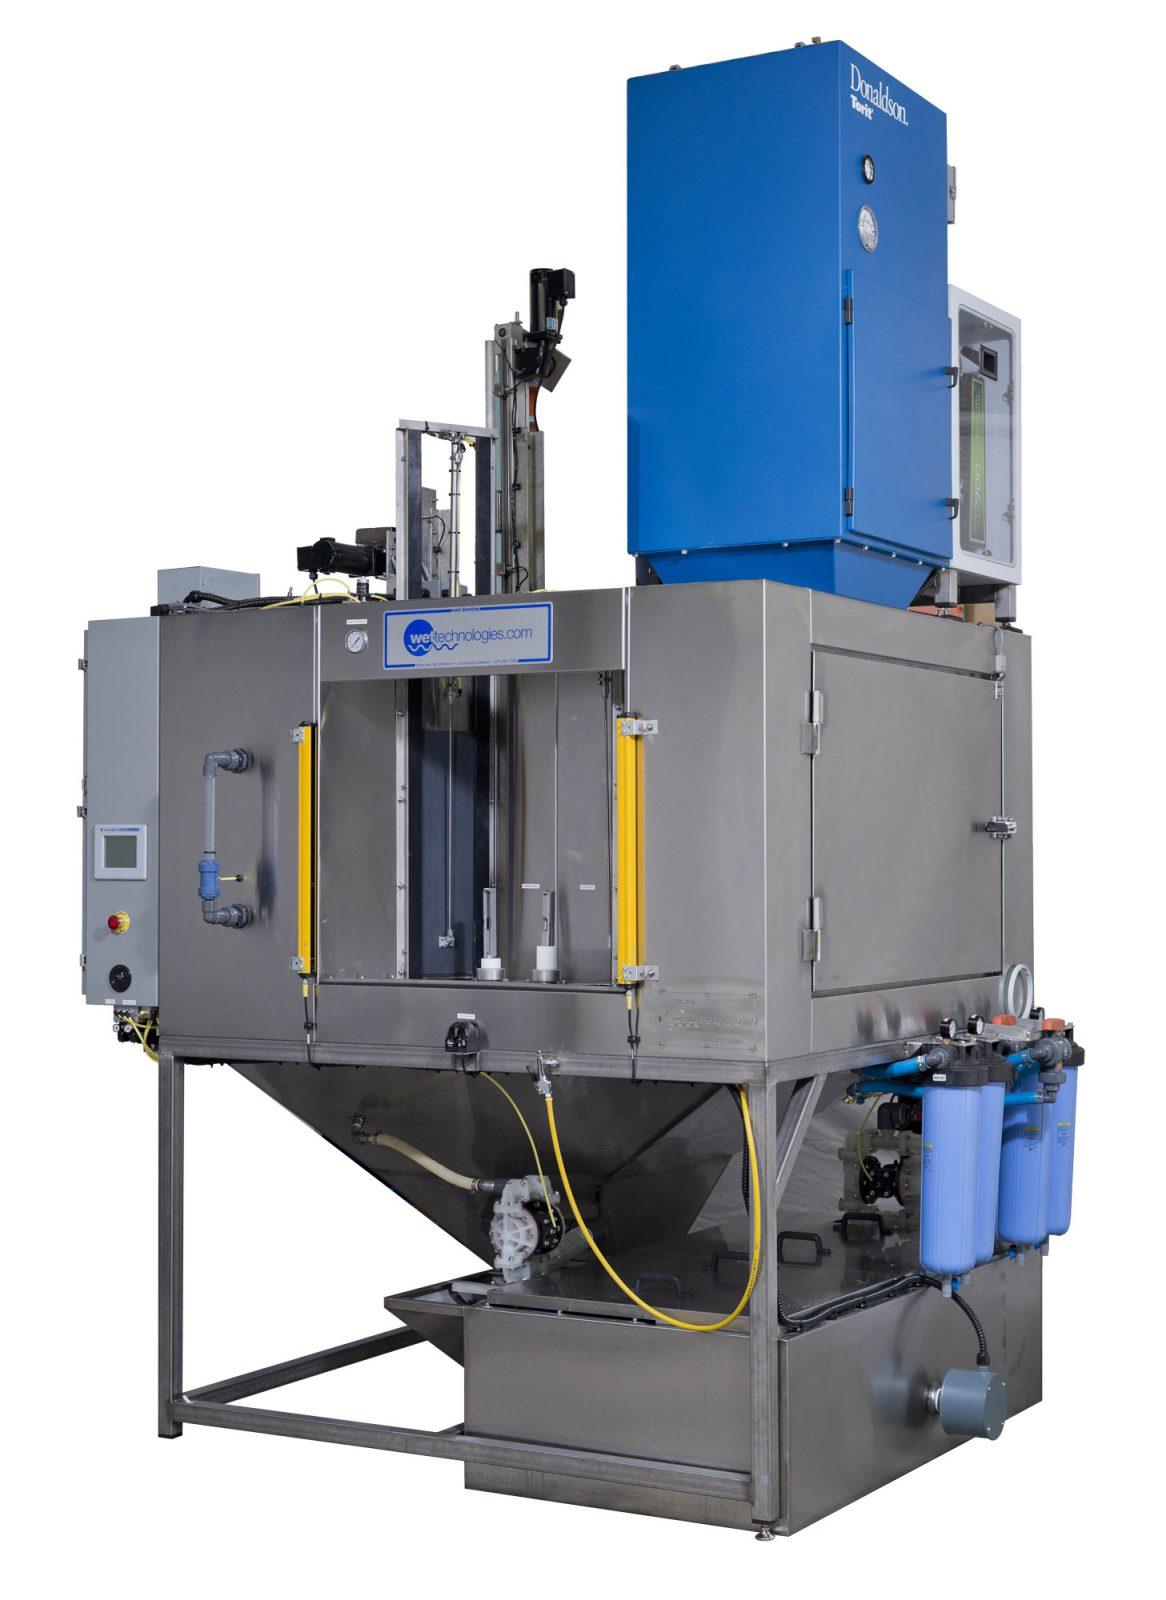 indexing wet blasting equipment